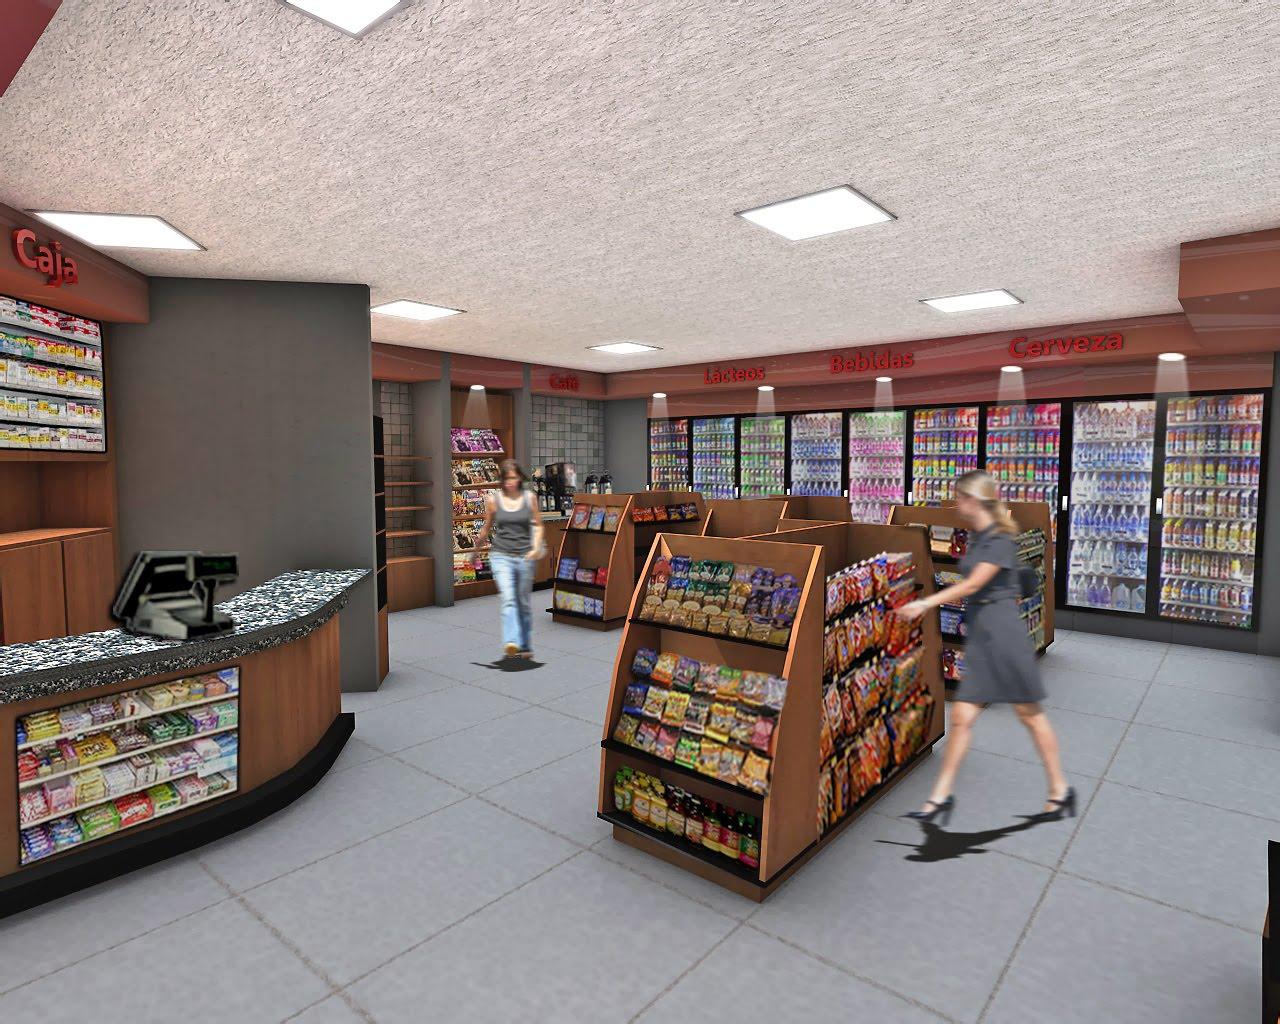 convenience store design ideas wwwgarcade online image interior